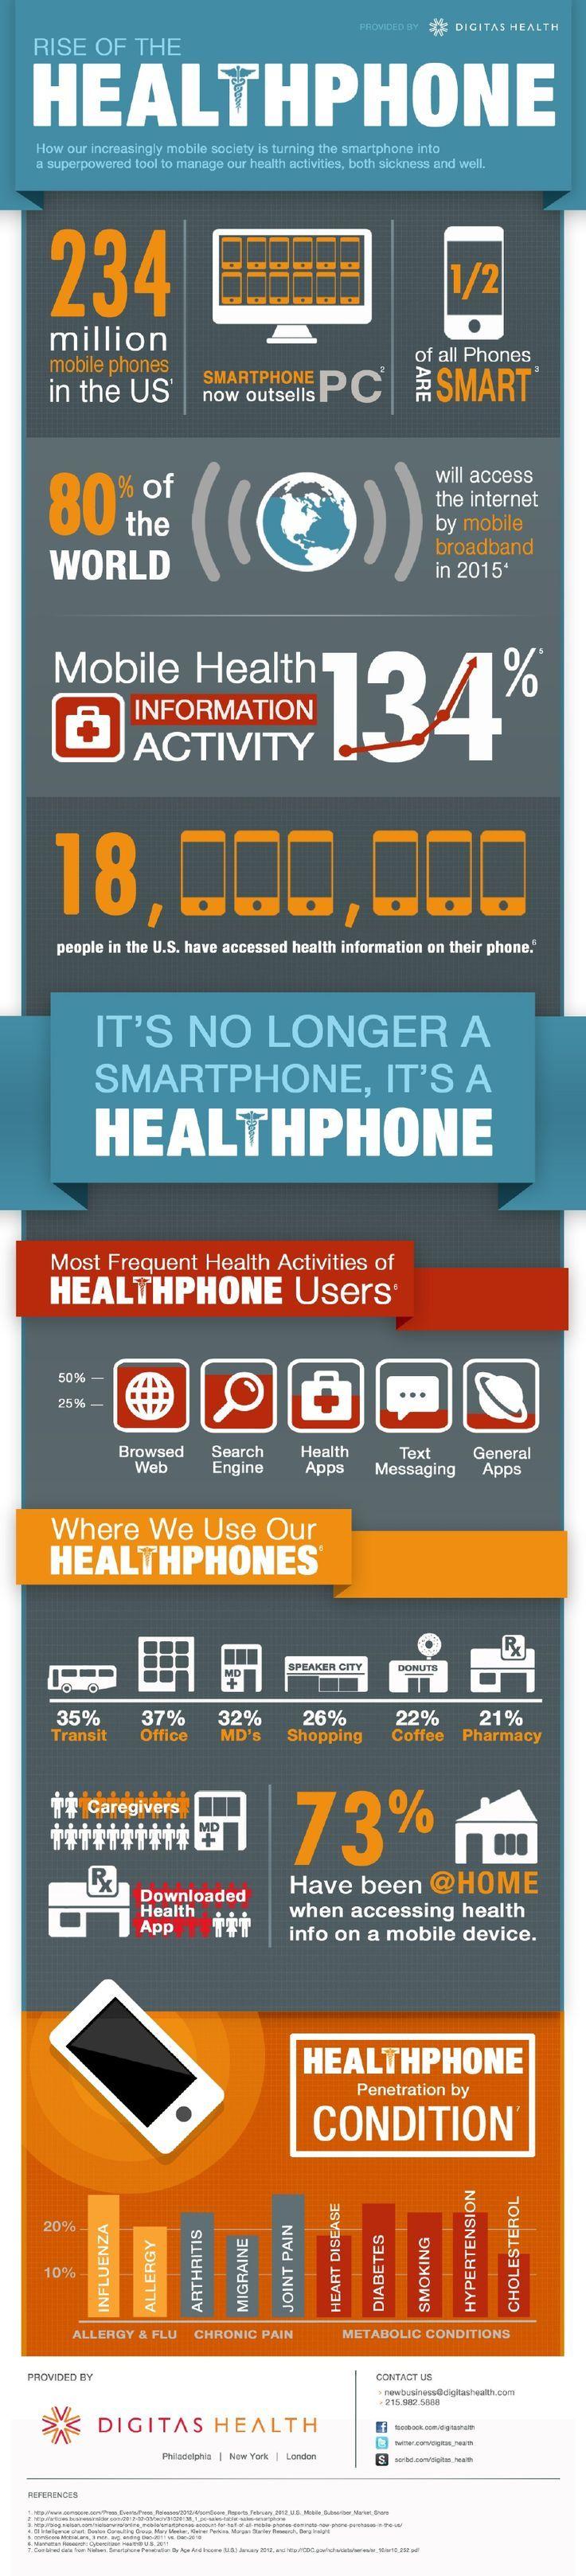 14316cbf029f214060443e49c2c9d2c4--smartphone-digital-health-and-wellness.jpg (736×3235)